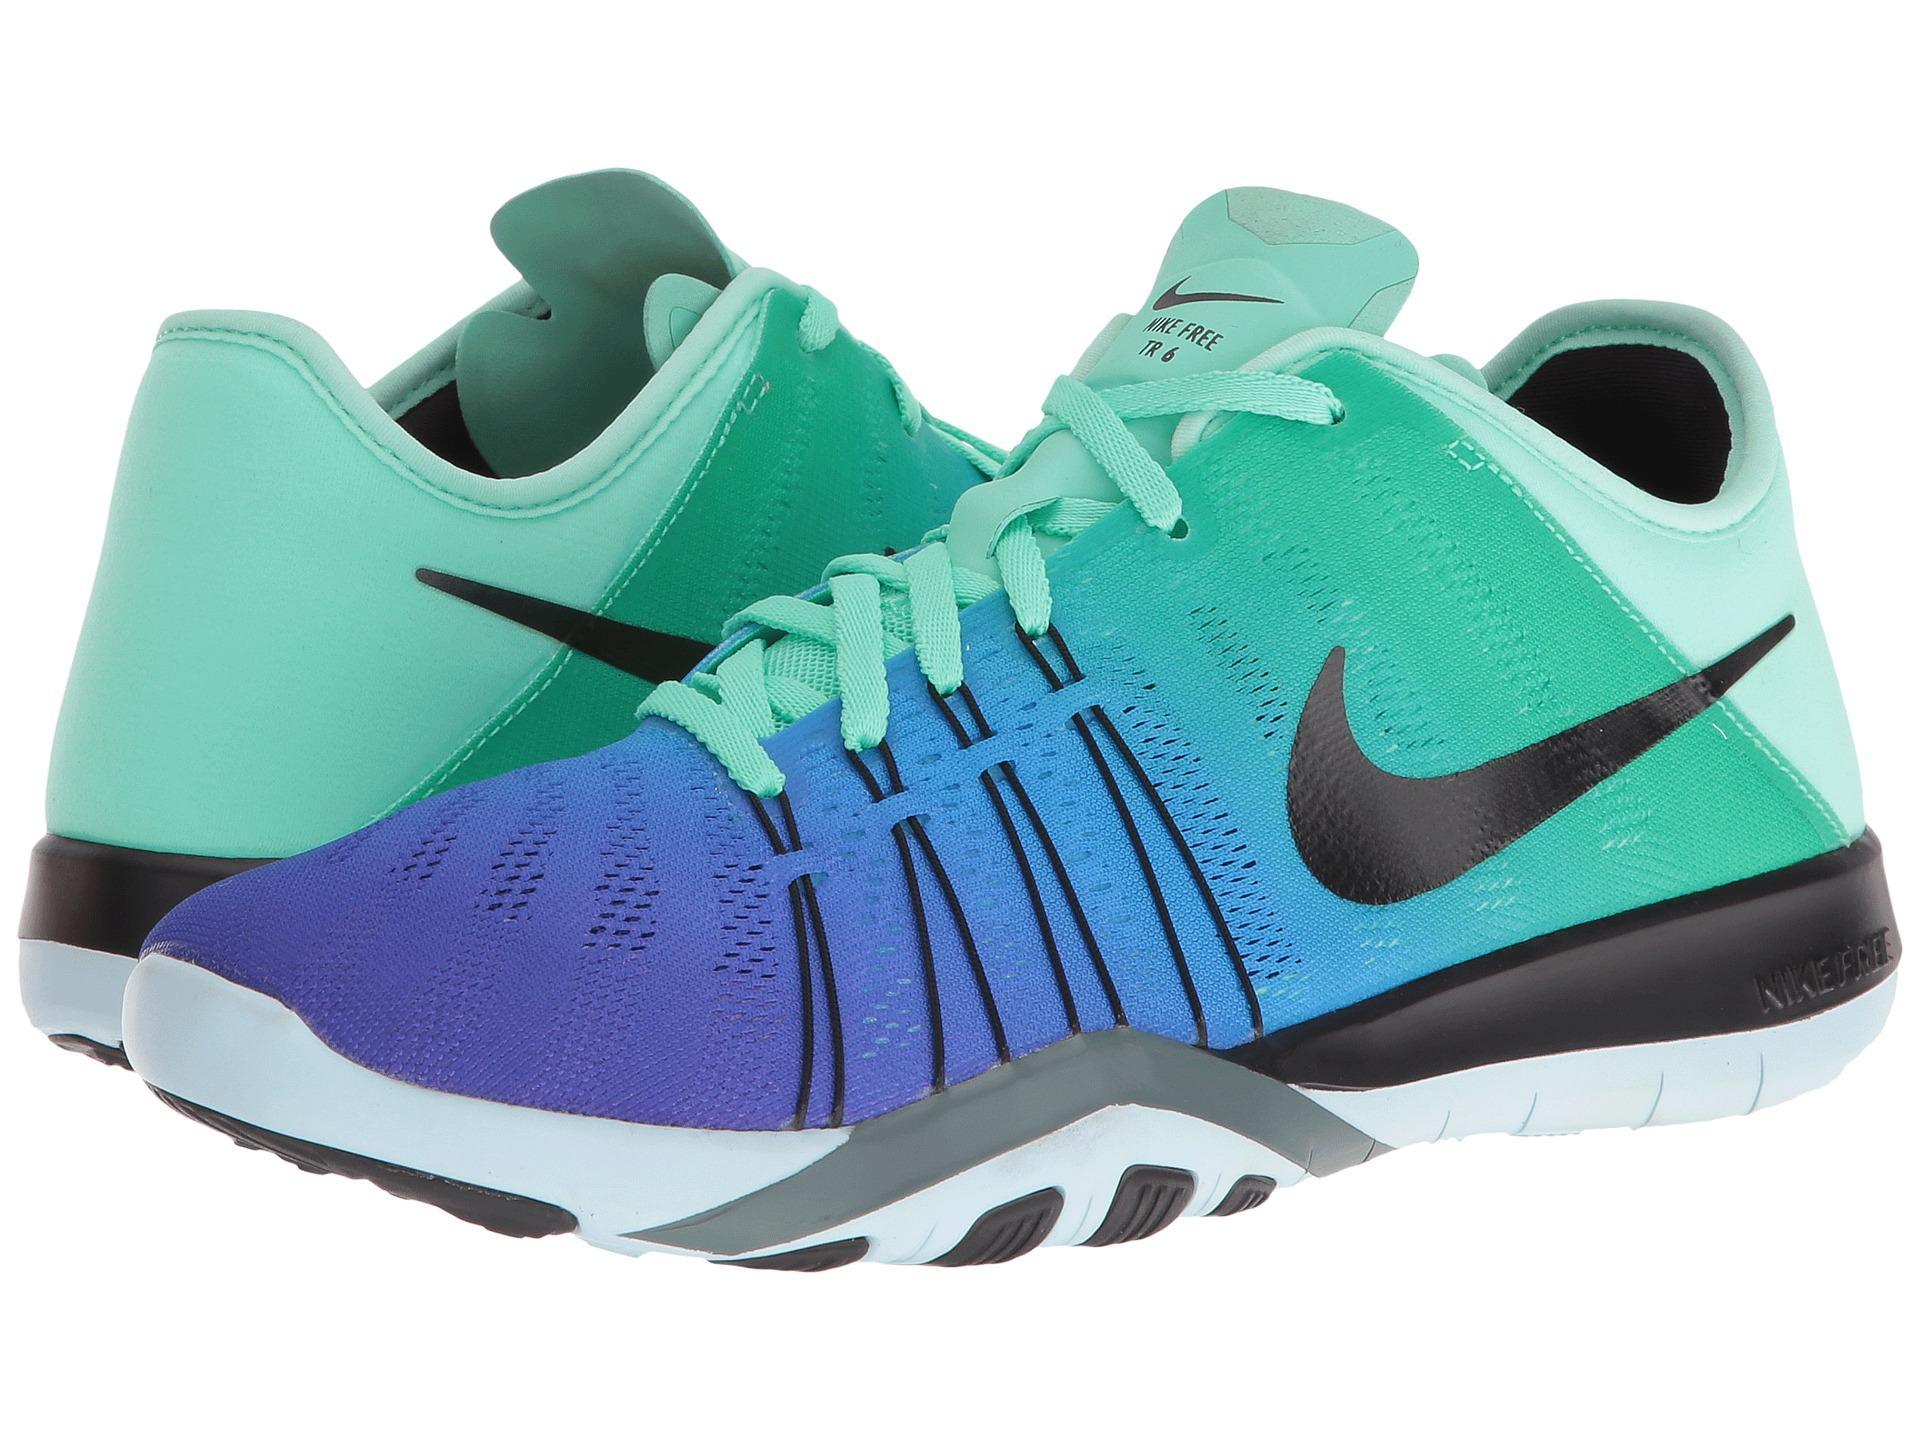 separation shoes 991cc 22a8e Nike Free Tr 6 Spectrum - Lyst